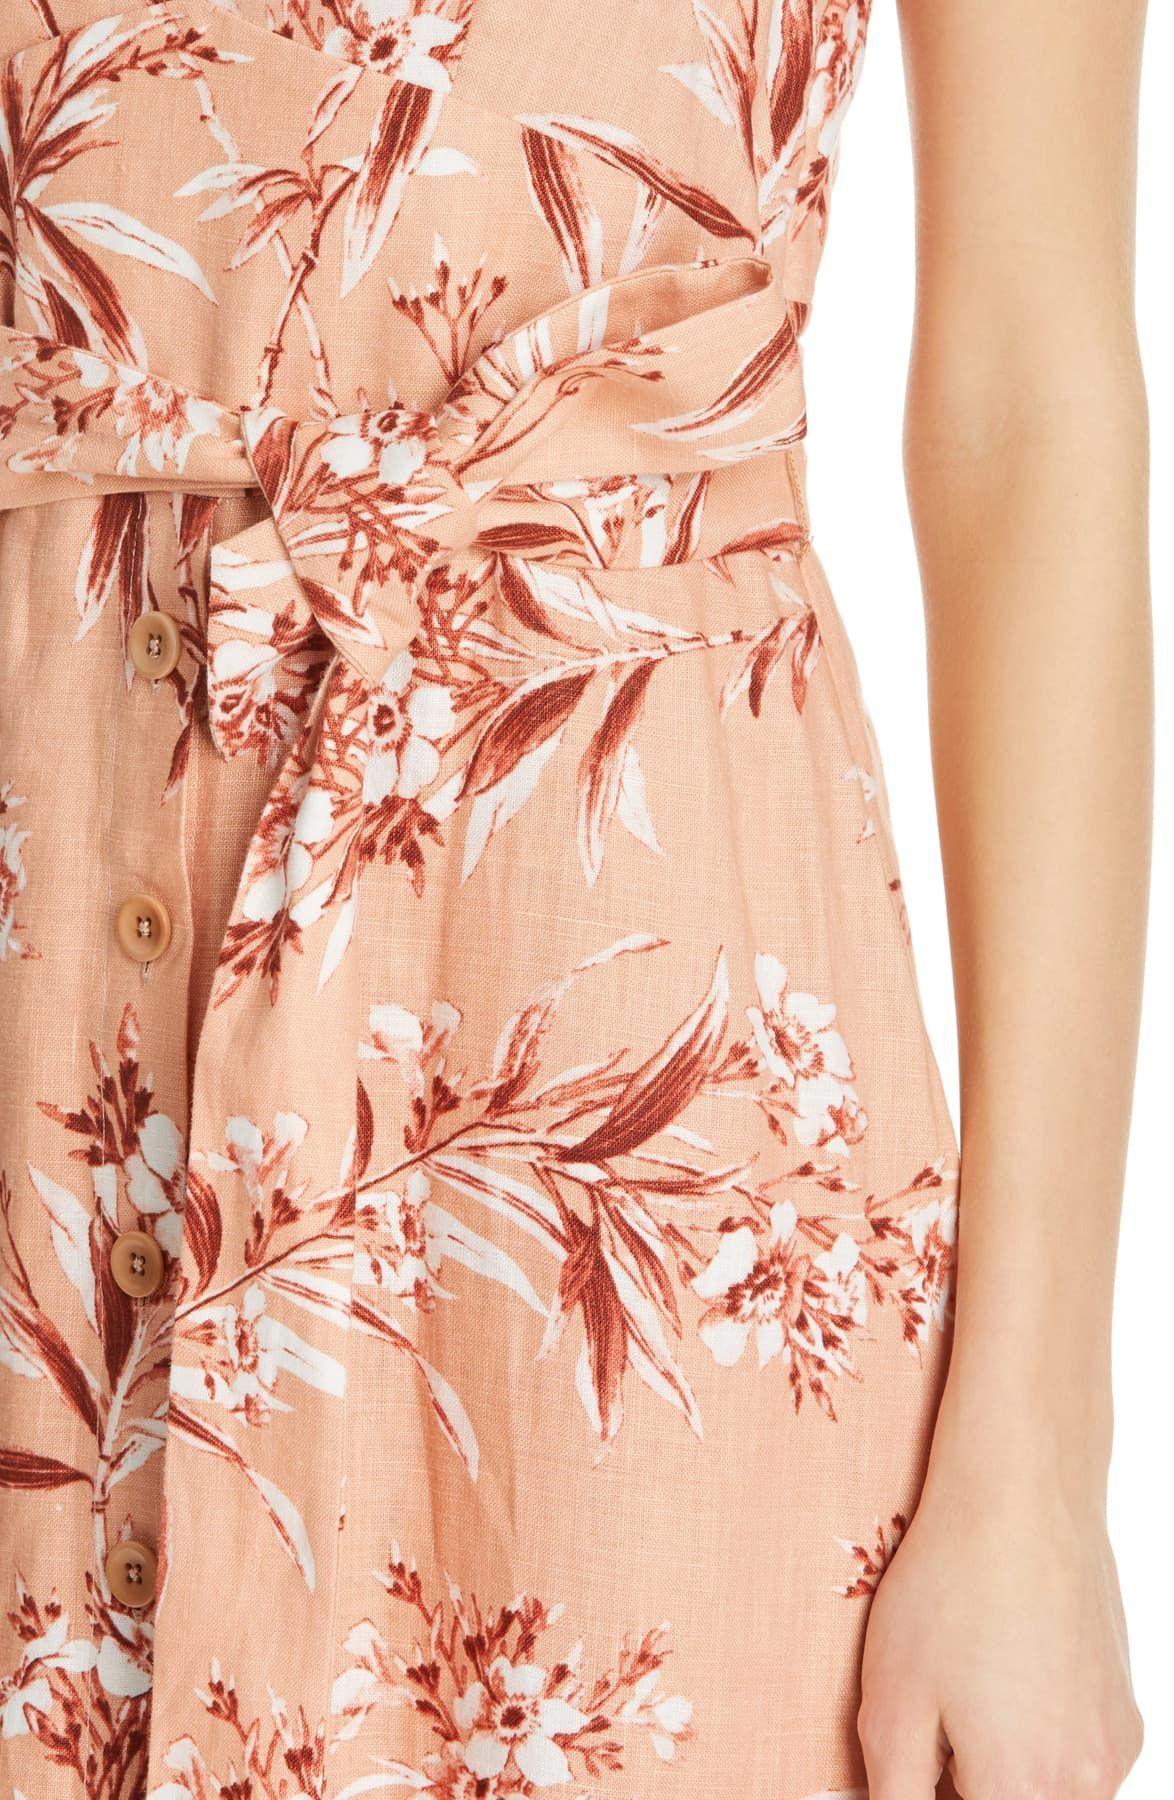 Joie Women's Dress Pink Size XS Sheath Ethelda Floral Printed Linen